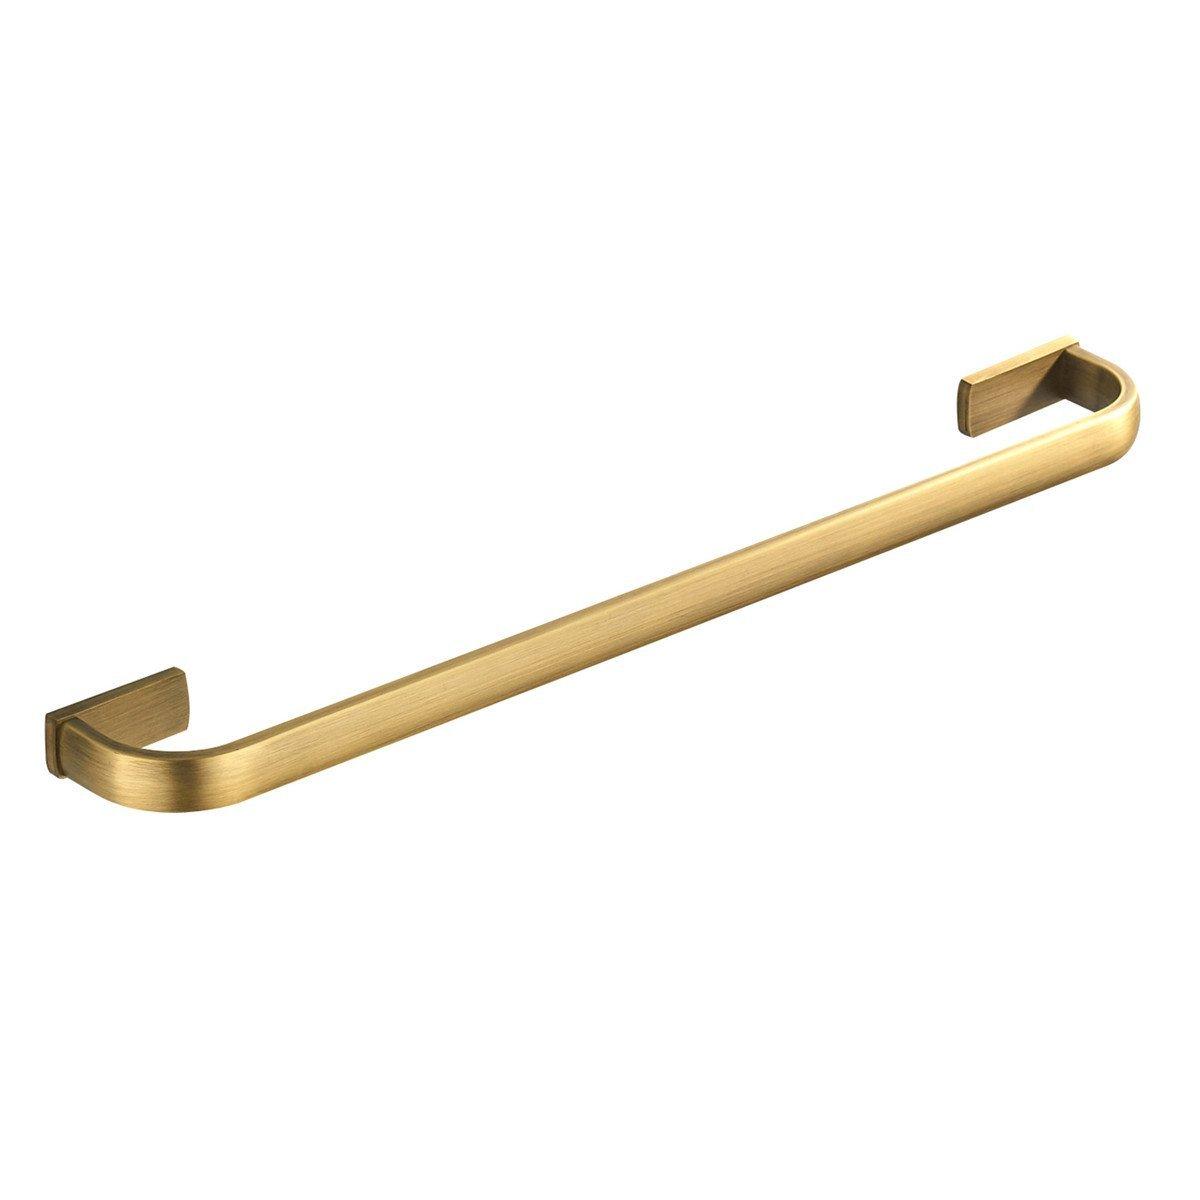 Bathfirst Towel Ring Holder 29.5 CM/11.6 Inchs Brass Golden for Bathroom